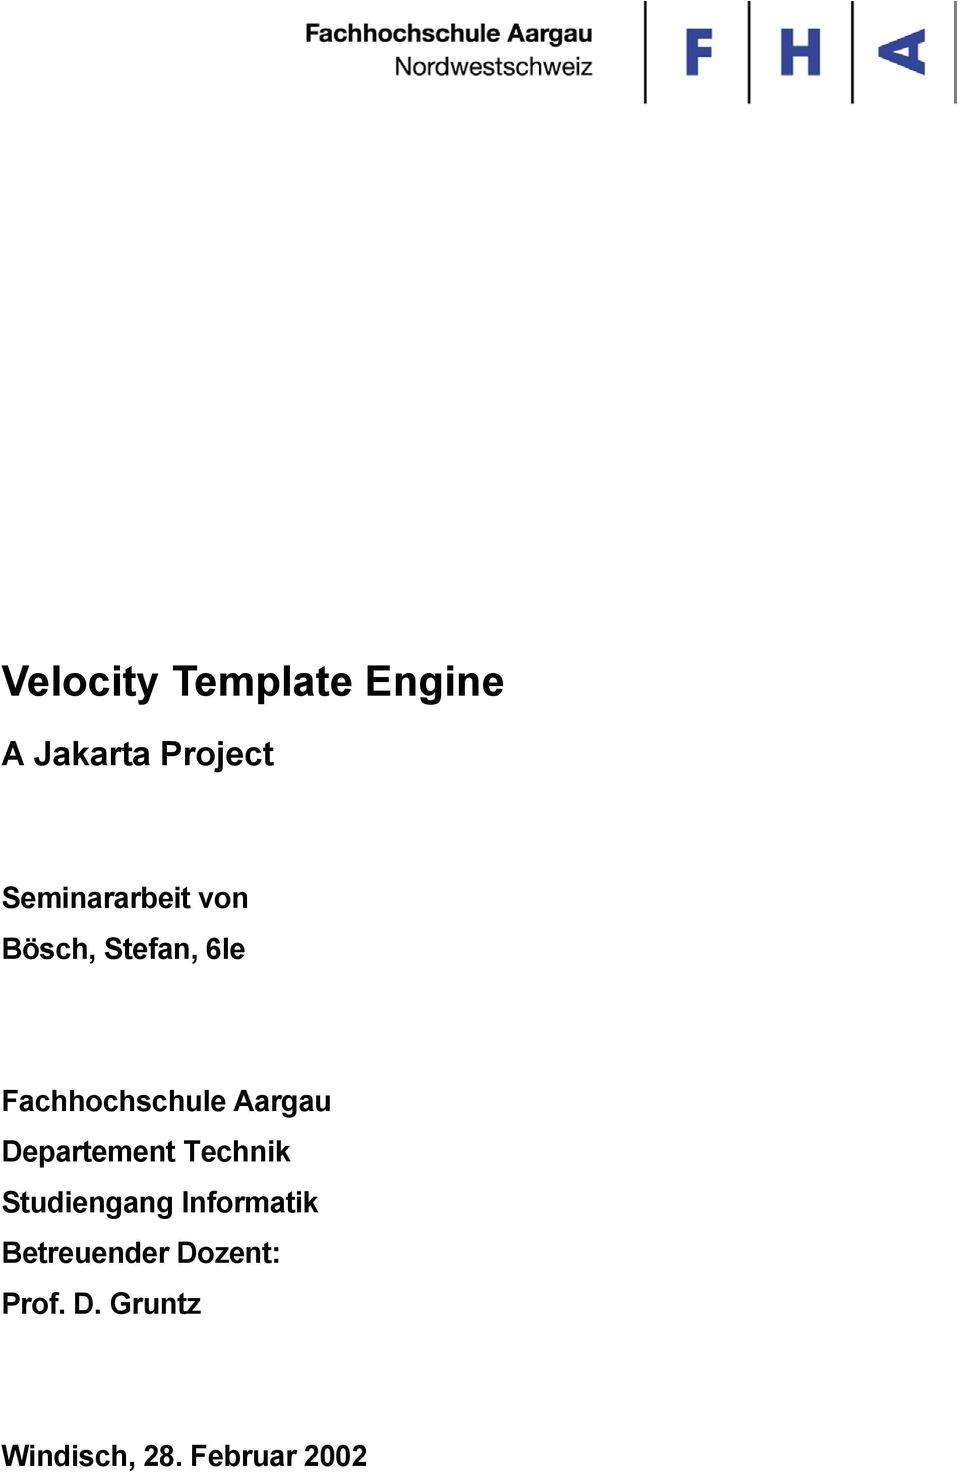 18953706 velocity template engine